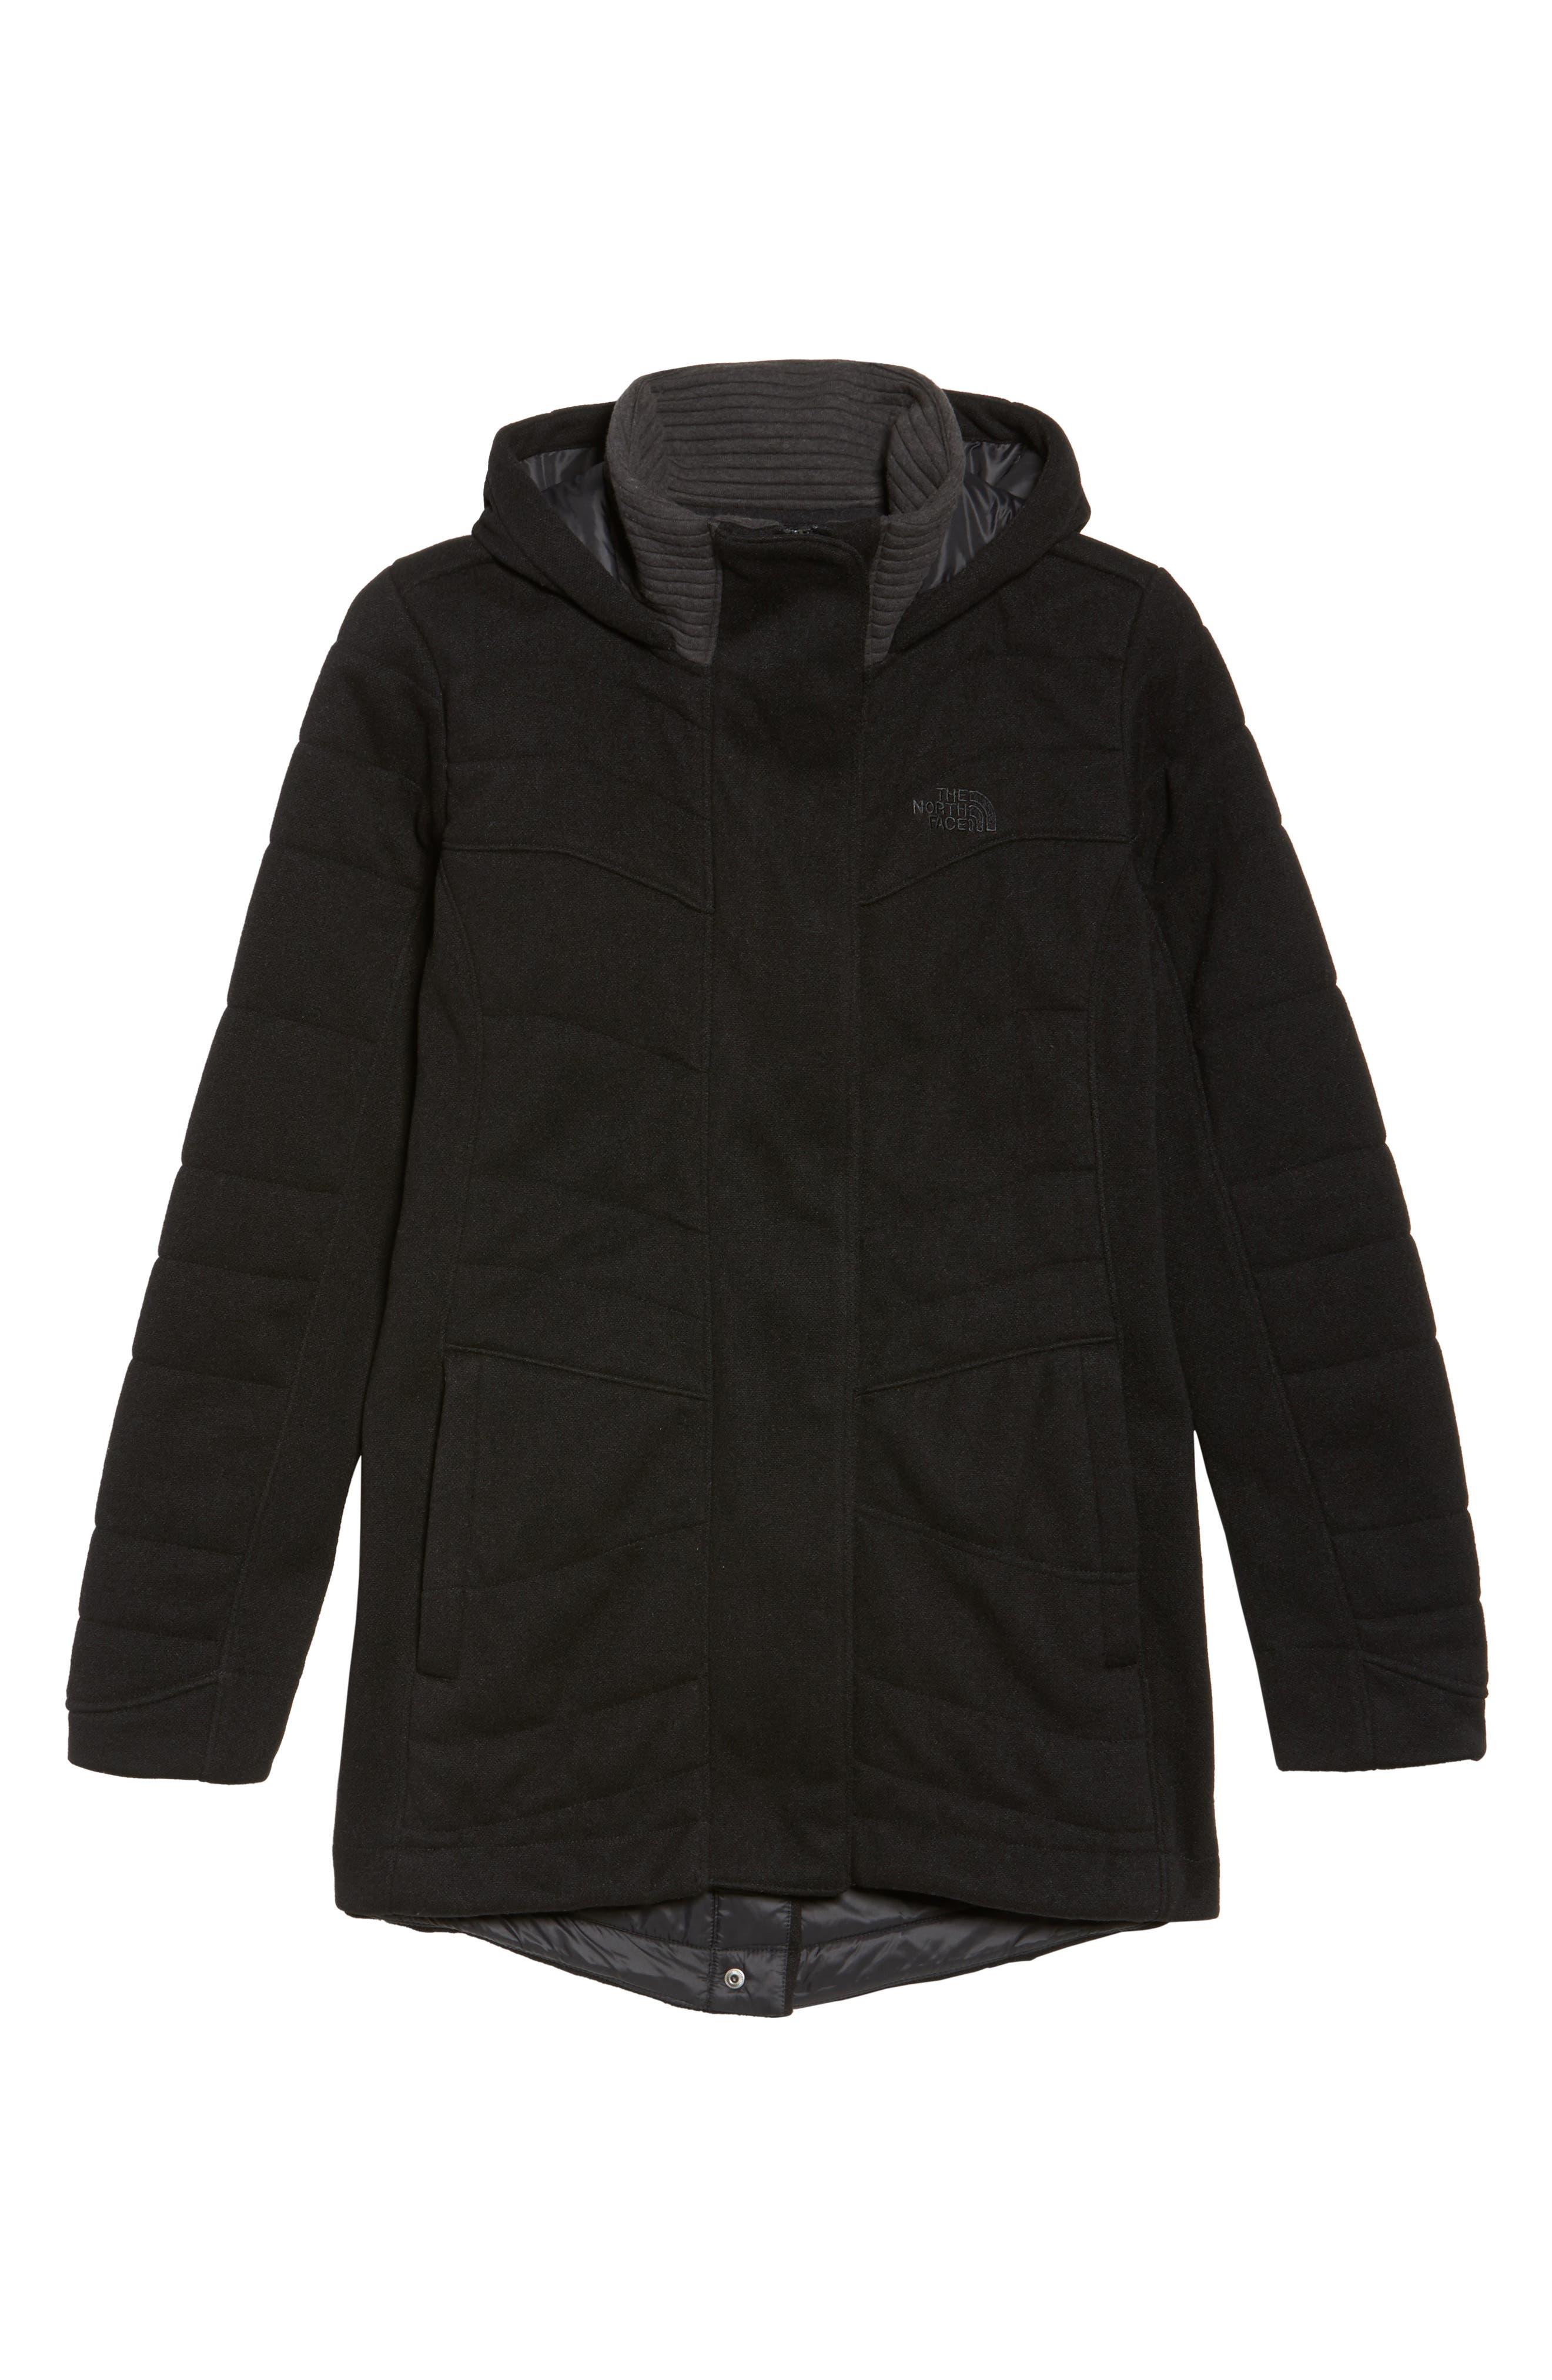 Indi Fleece Jacket,                             Alternate thumbnail 6, color,                             001